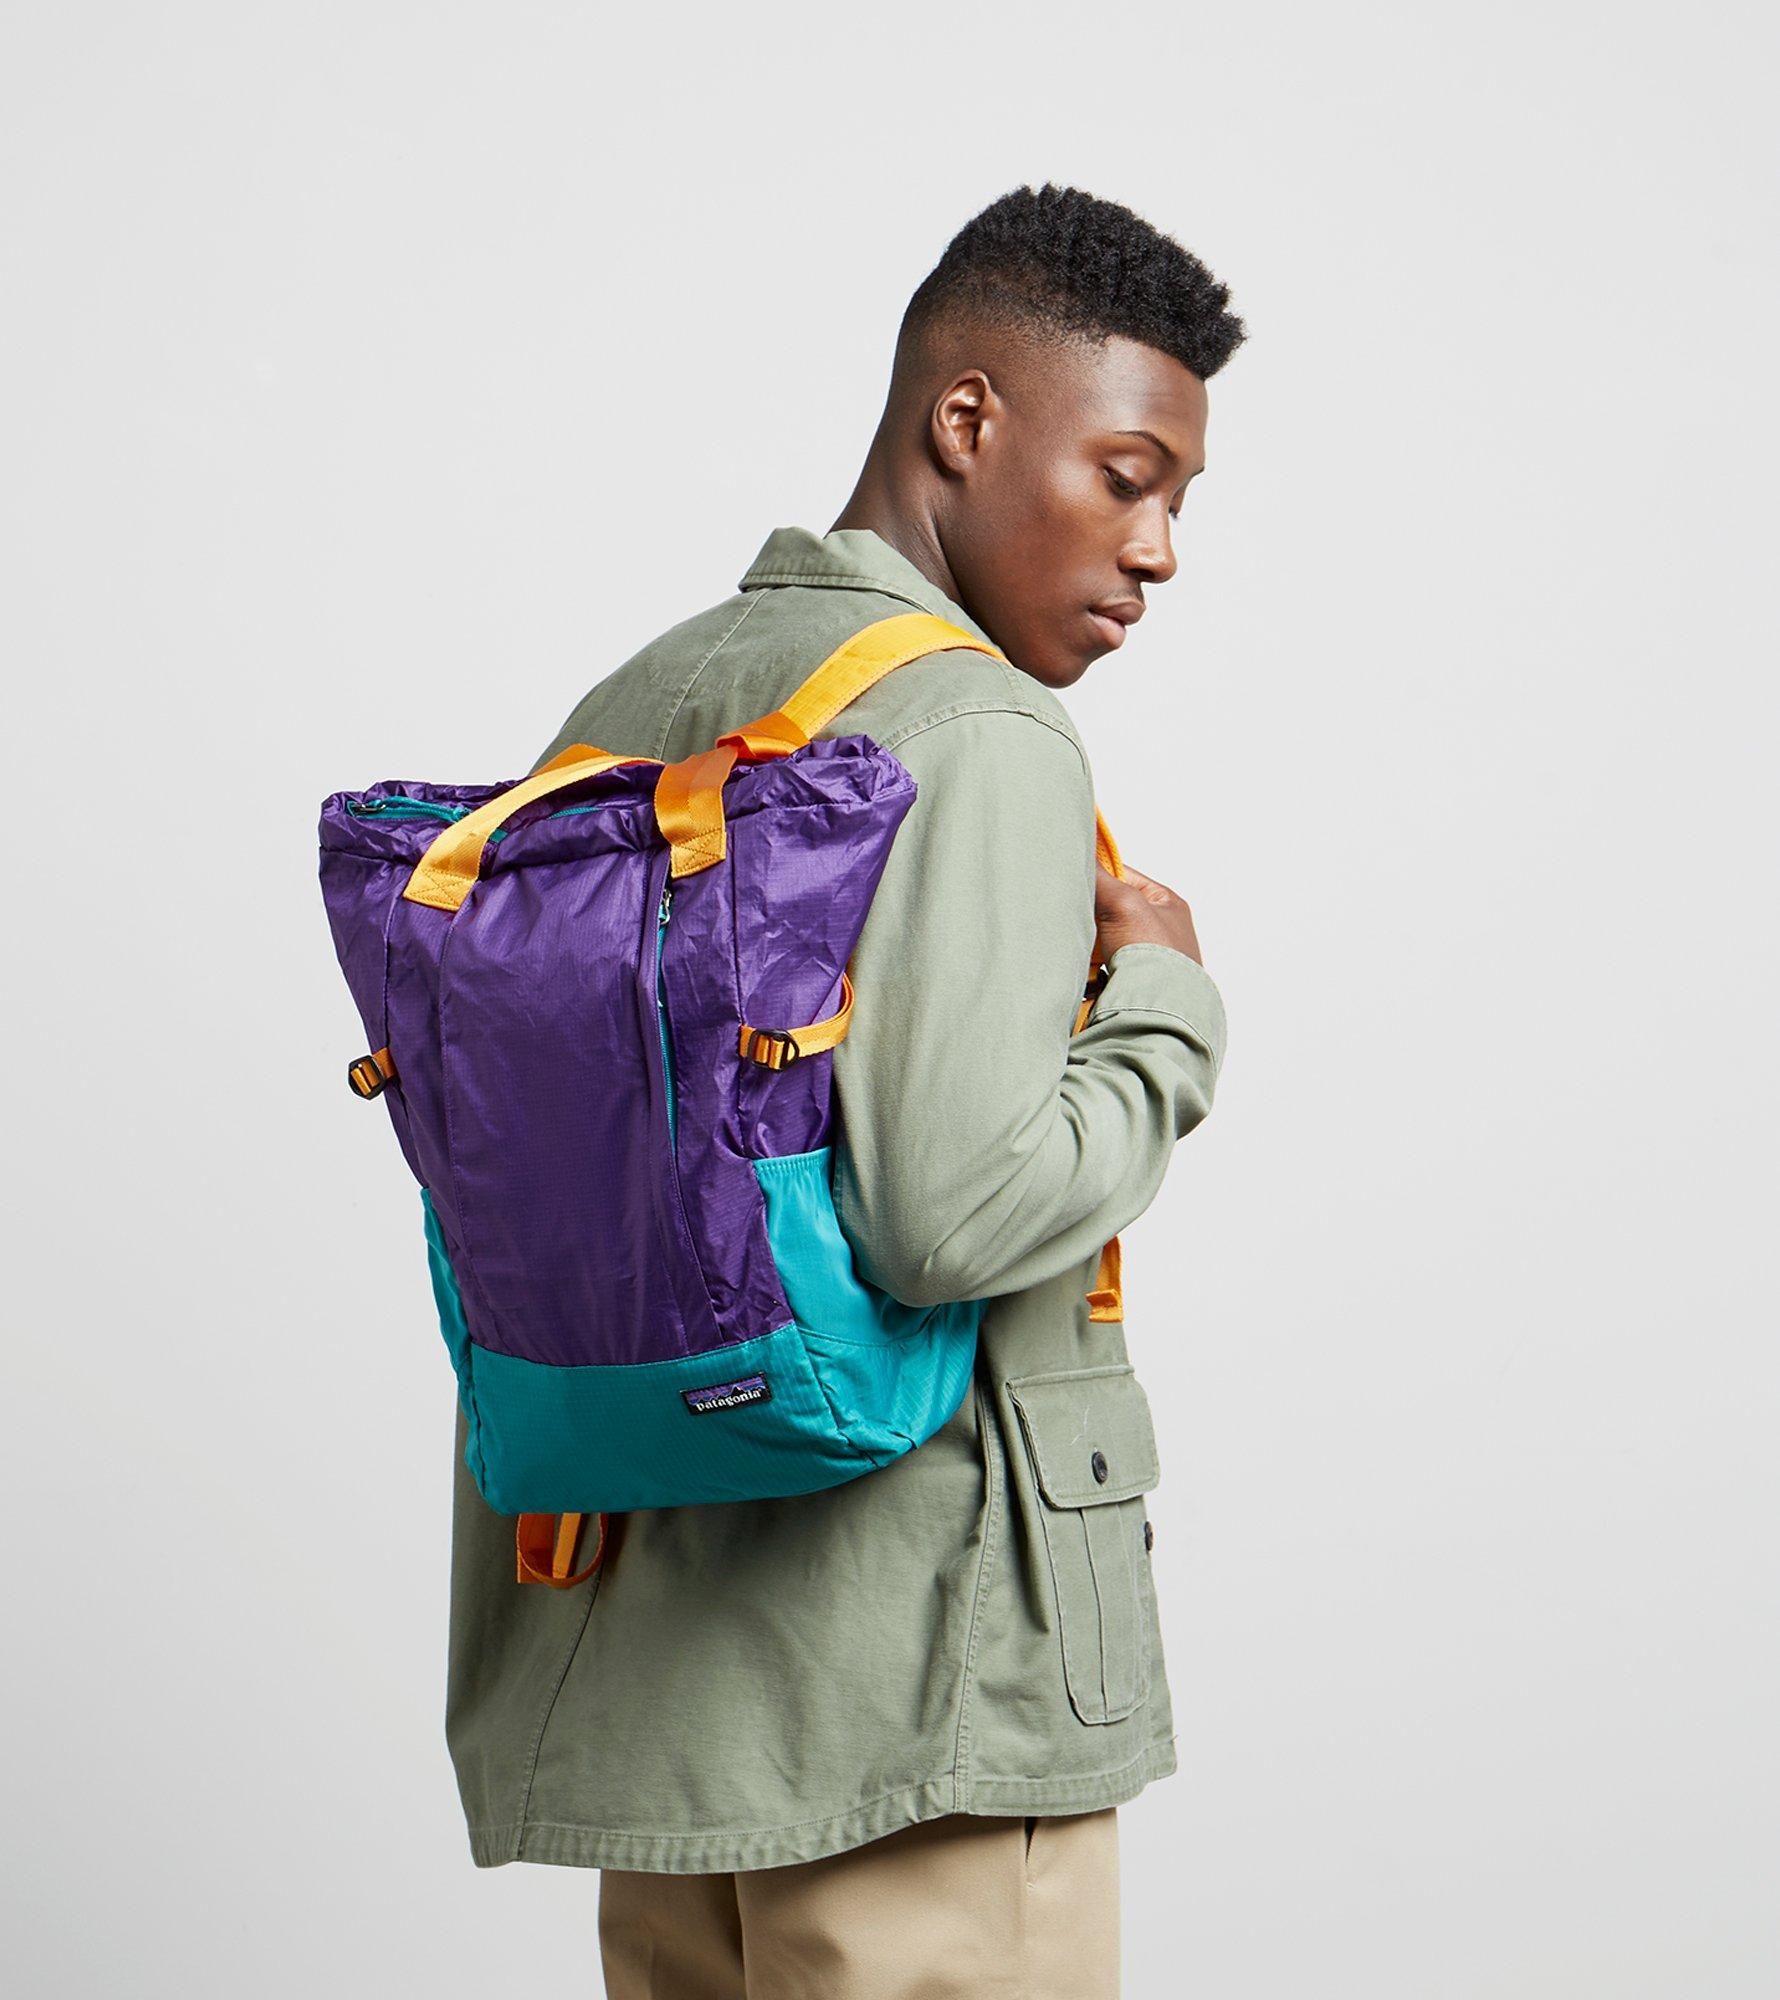 patagonia lightweight travel tote bag - Travel Tote Bags